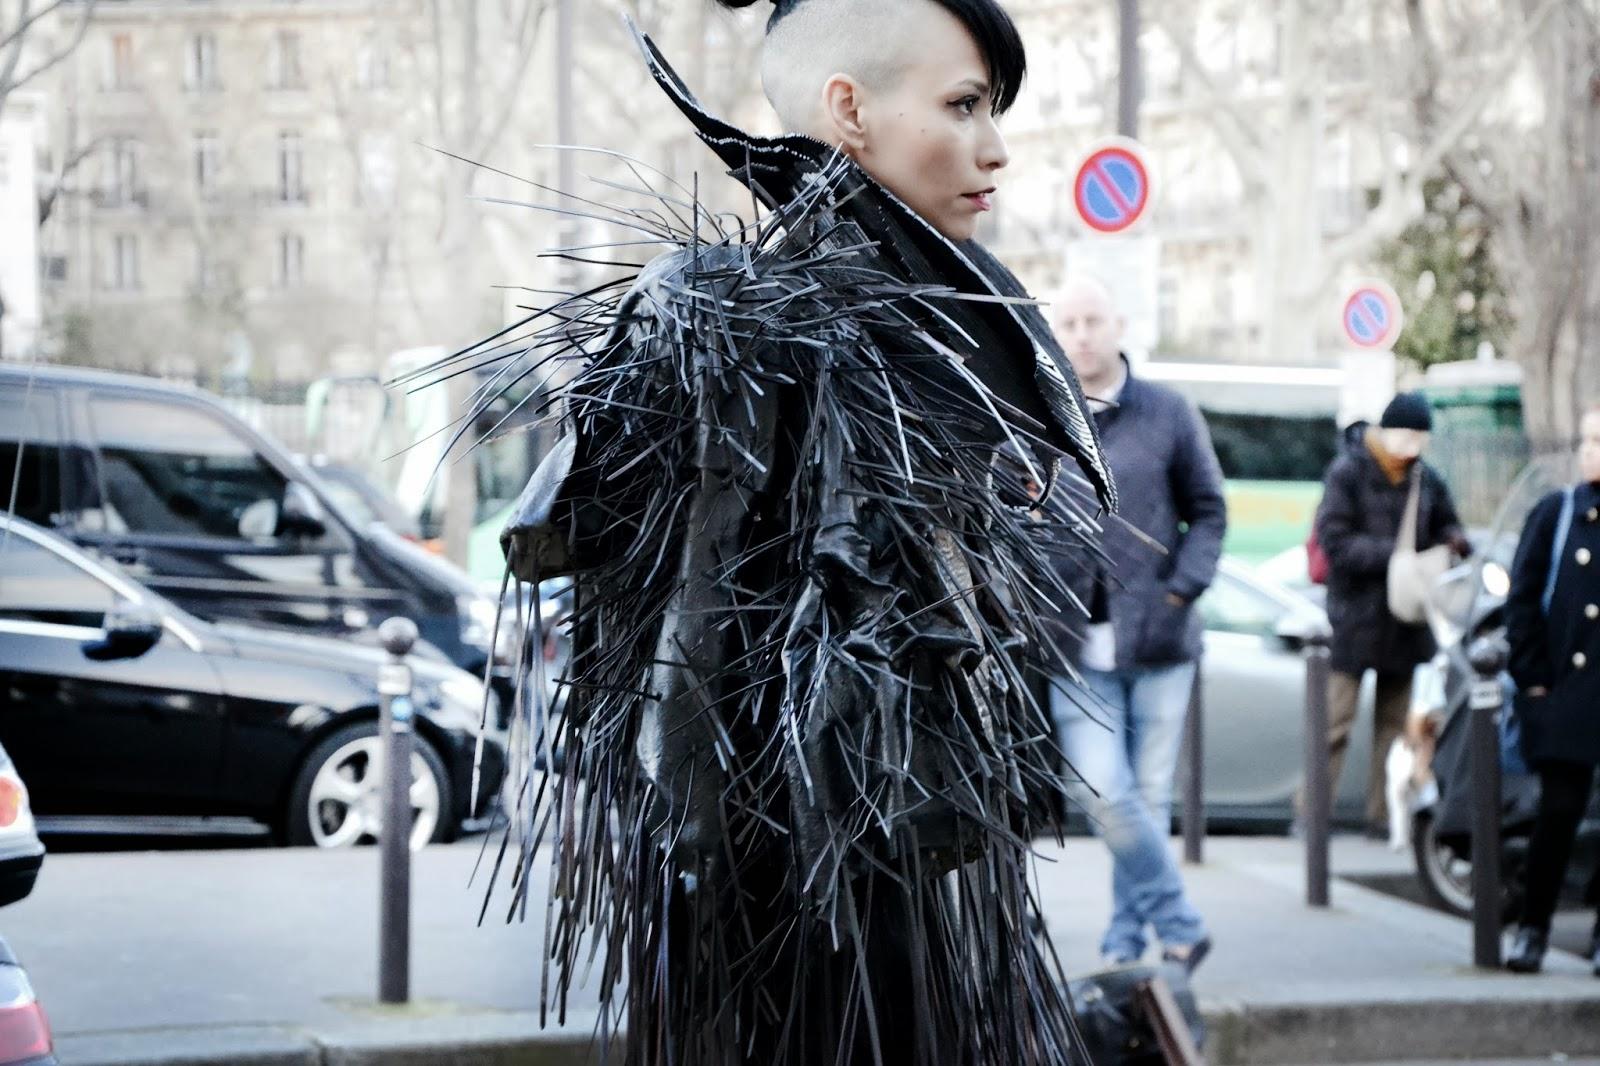 jorge-ayala-createur-fashion-lily-gatins (5).JPG